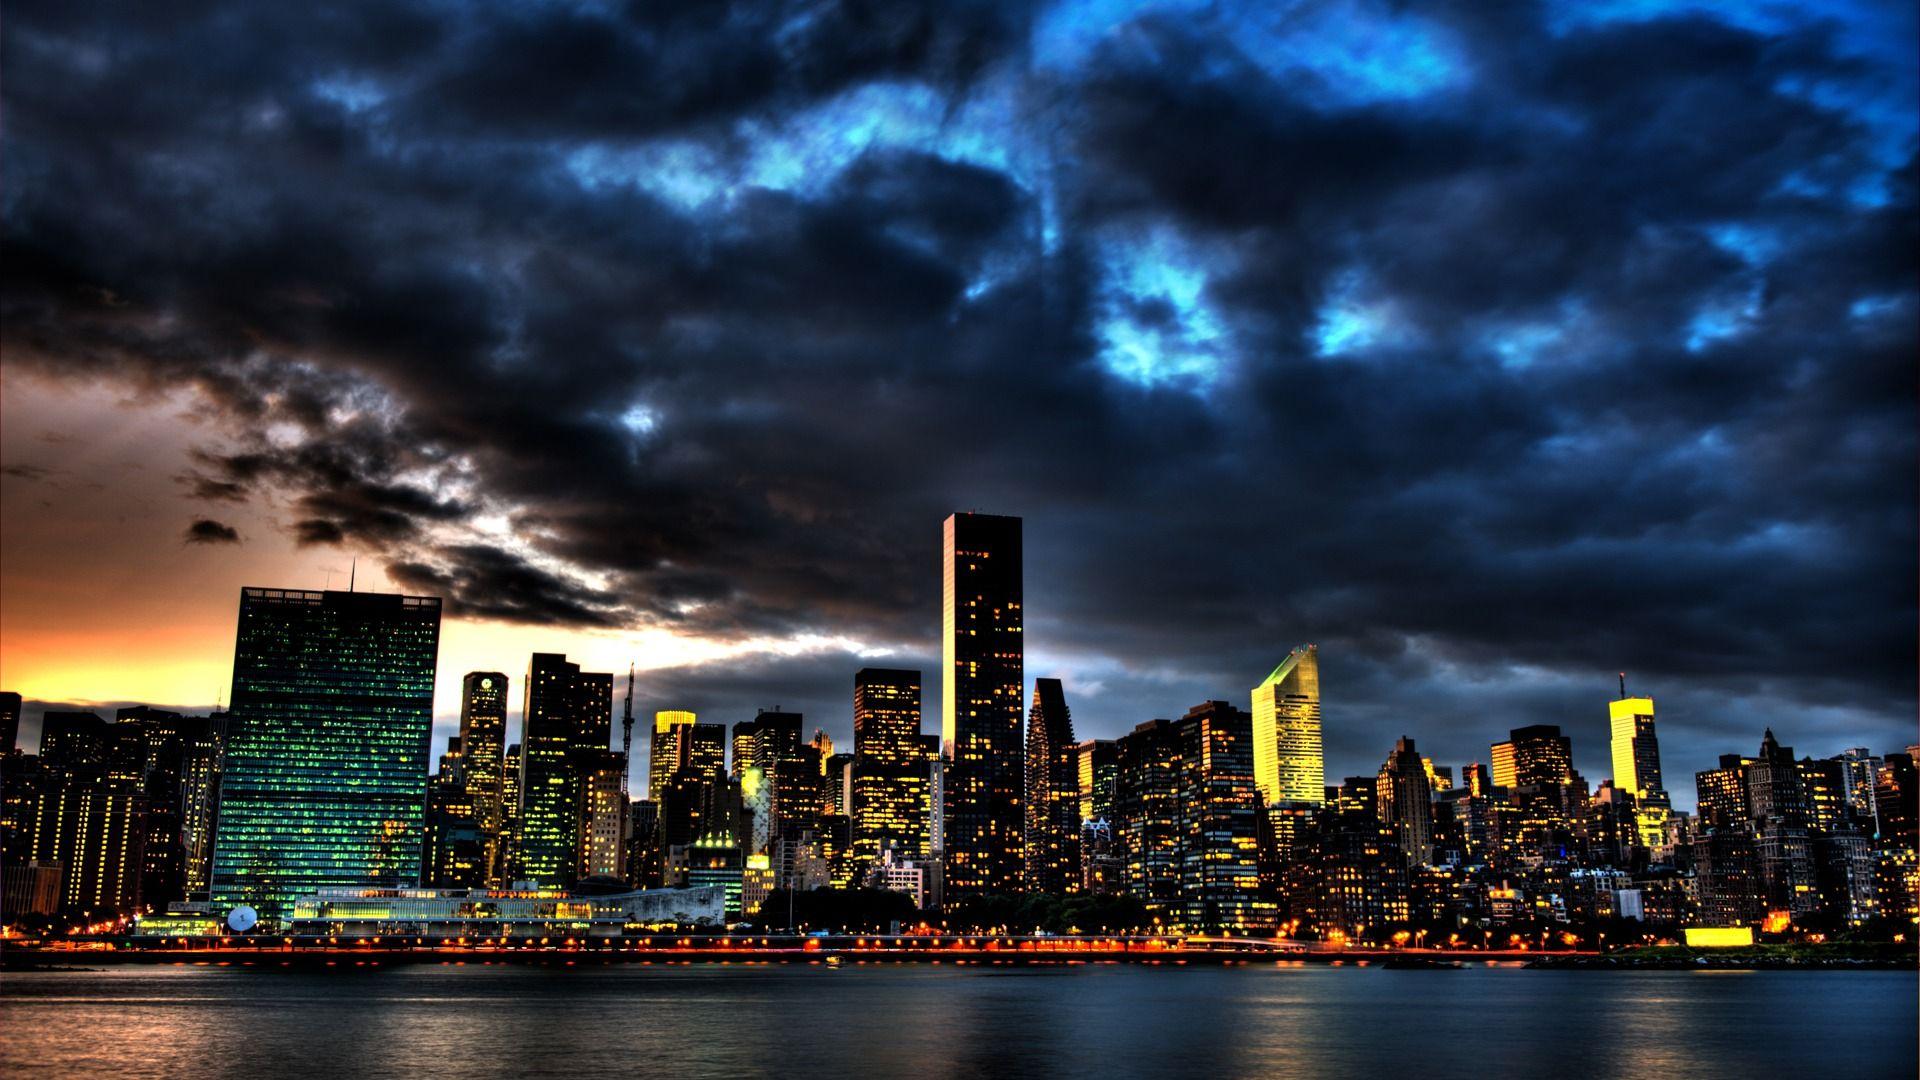 New York City Skyline 1080p Wallpaper City HD Wallpapers Source